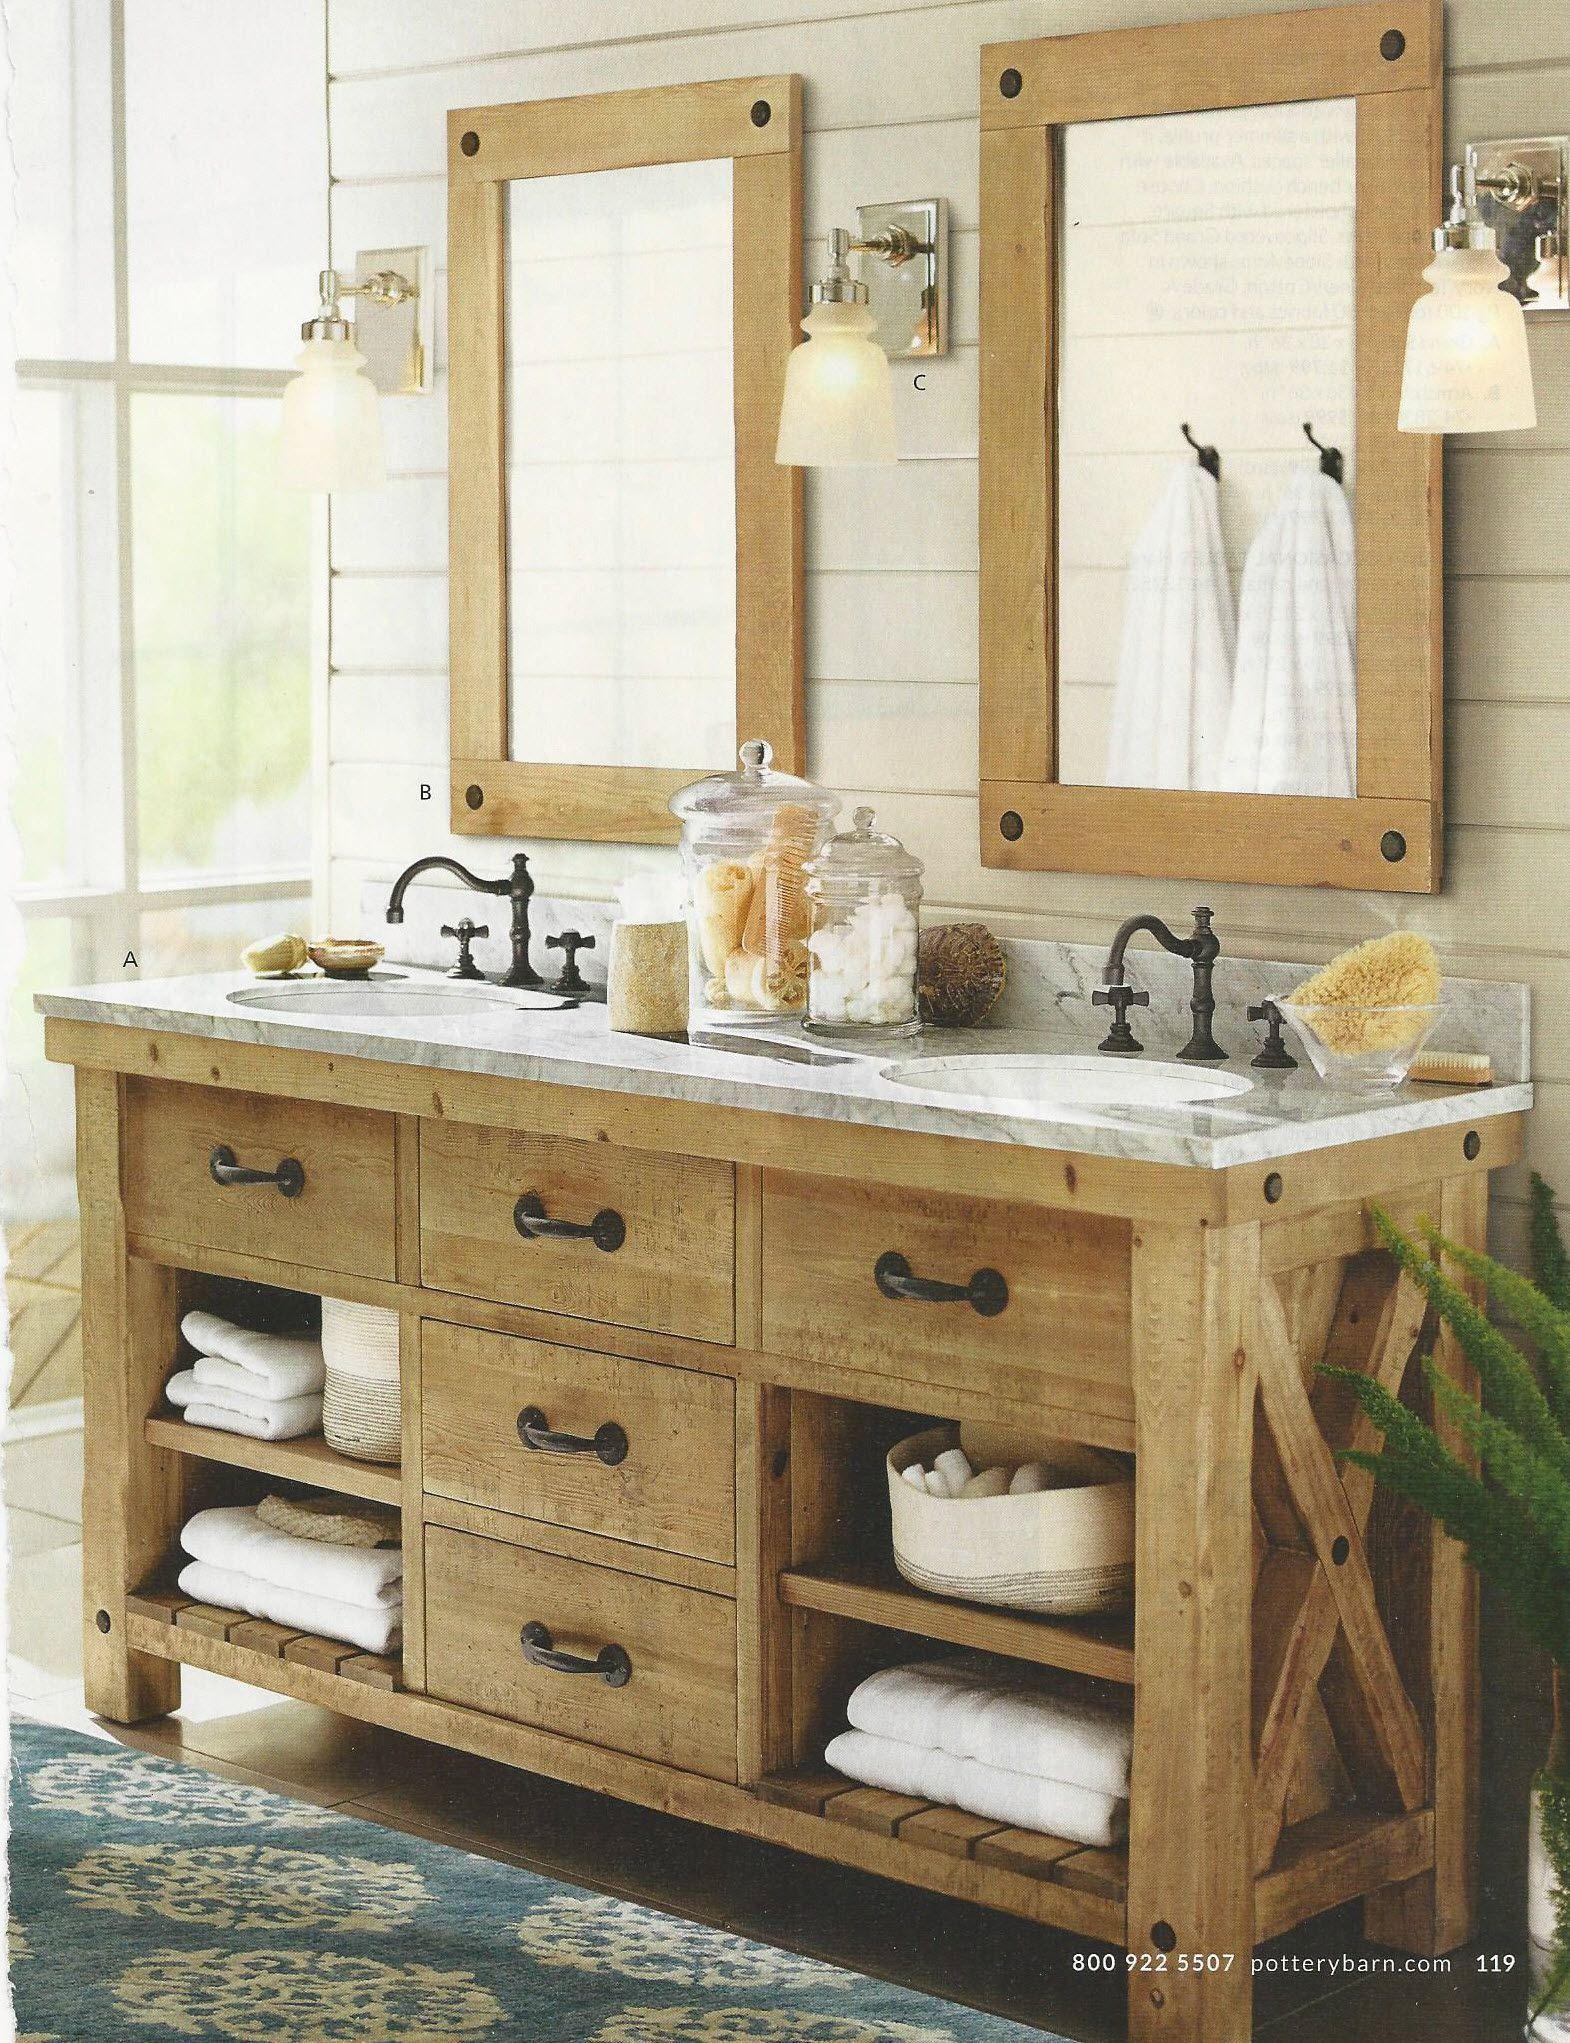 Basement bath cabinetry Home Matters Pinterest Basements and Bath